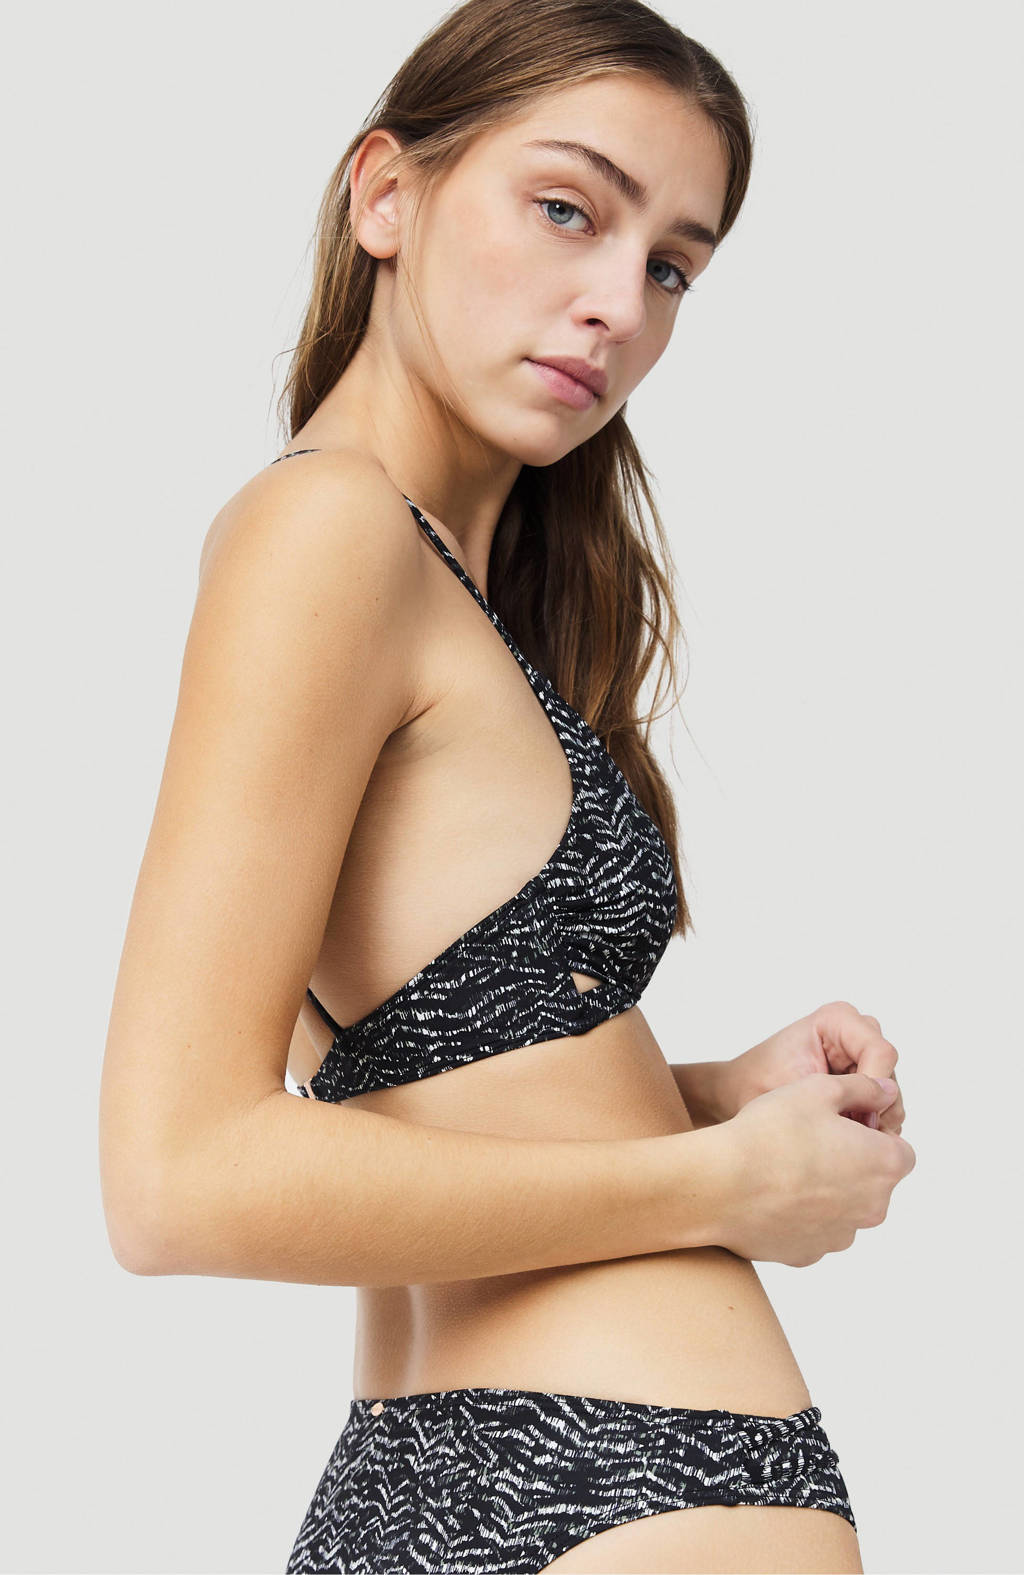 O'Neill triangel bikinitop Baay met all over print zwart/wit, Zwart/wit